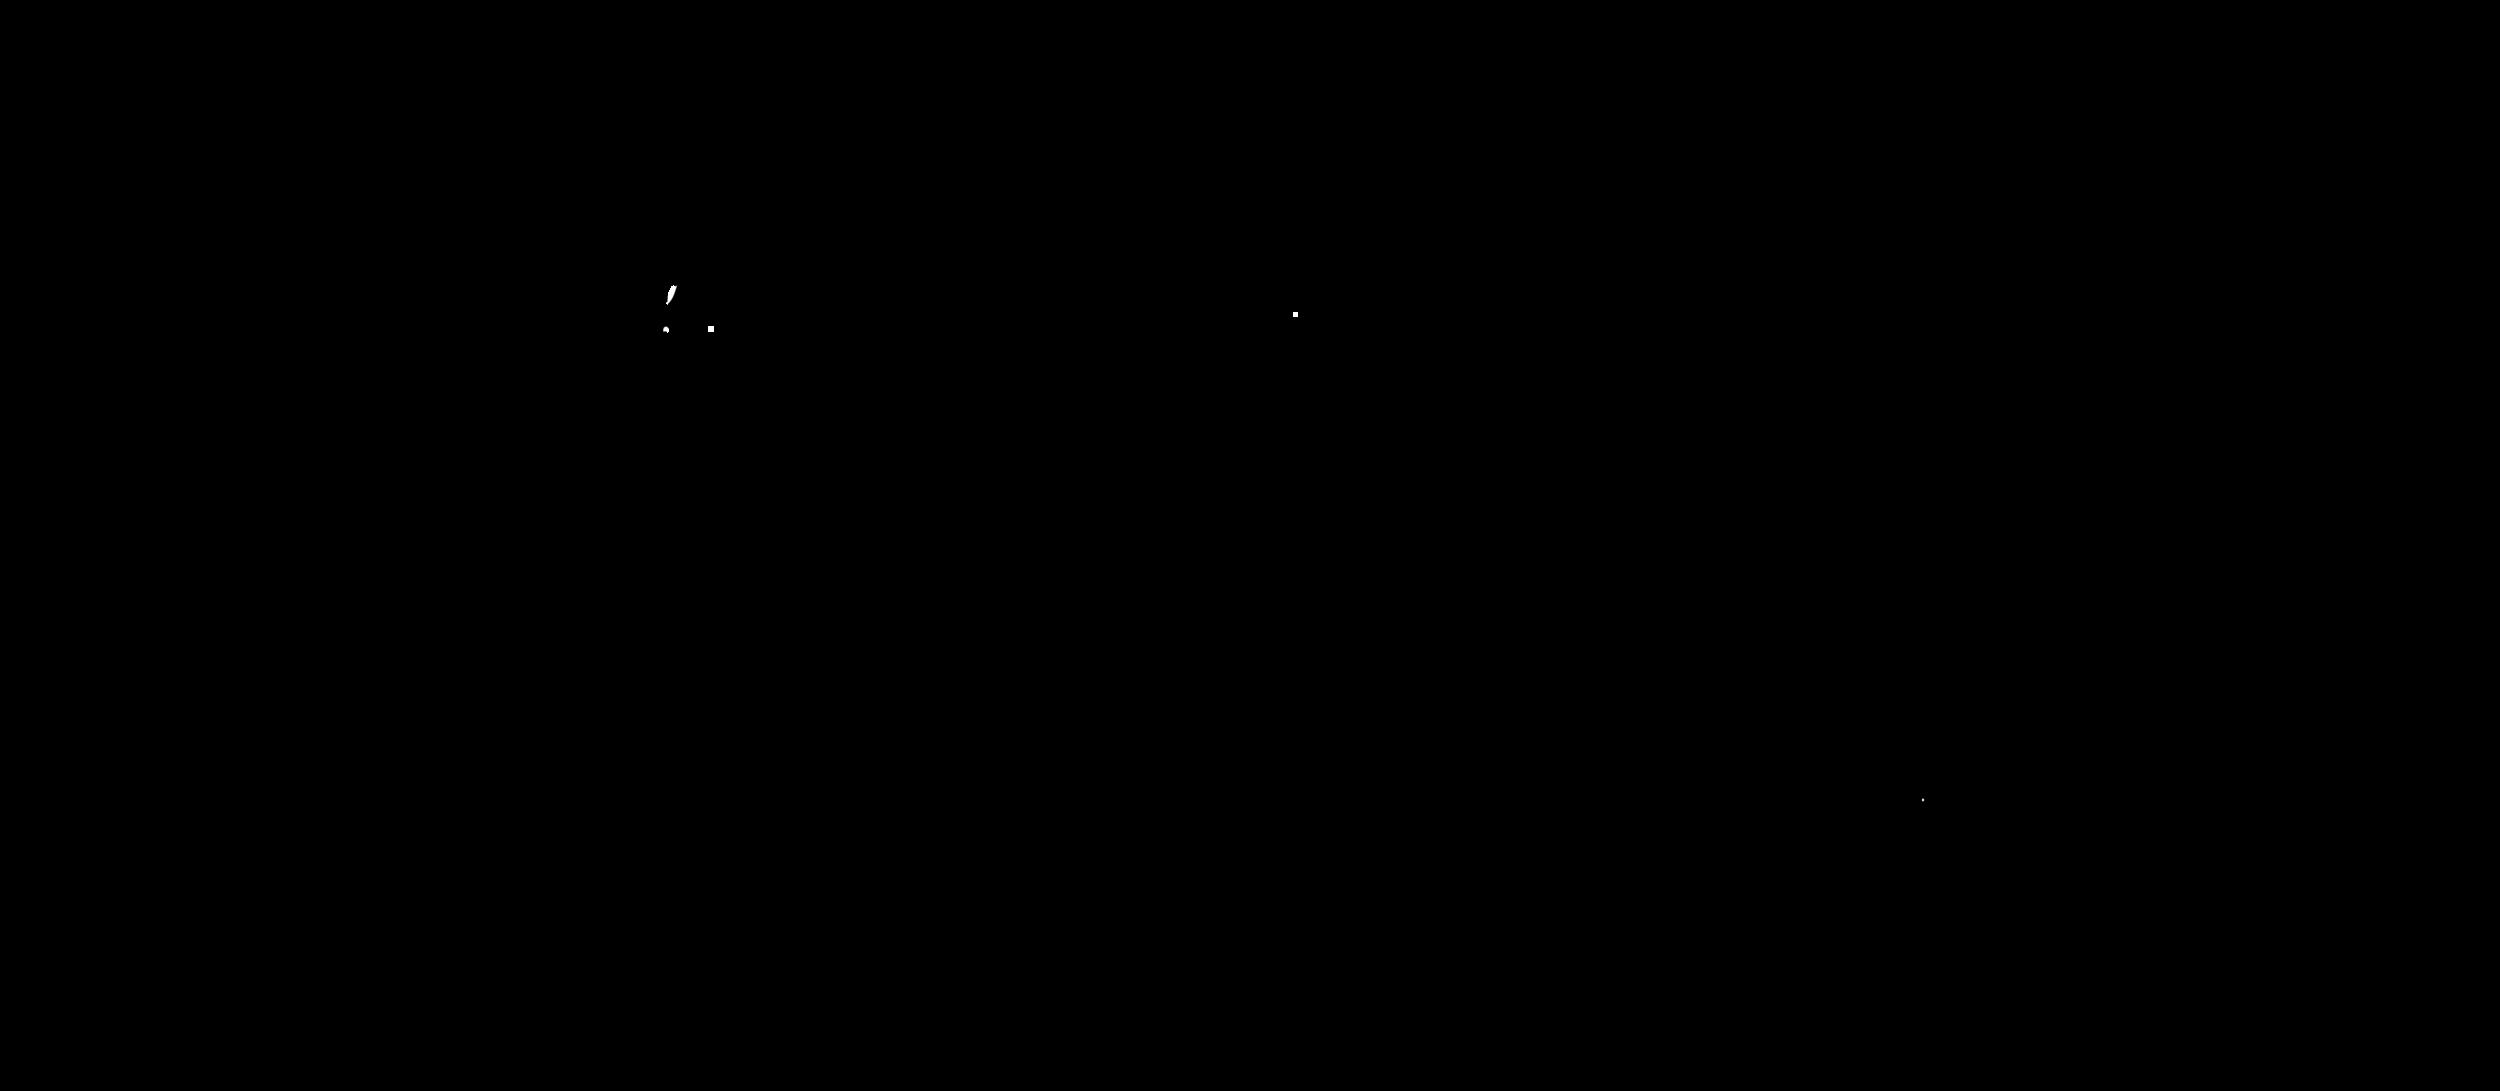 5df36823-3e5b-46db-8c34-9b9bdd7d75d5.png